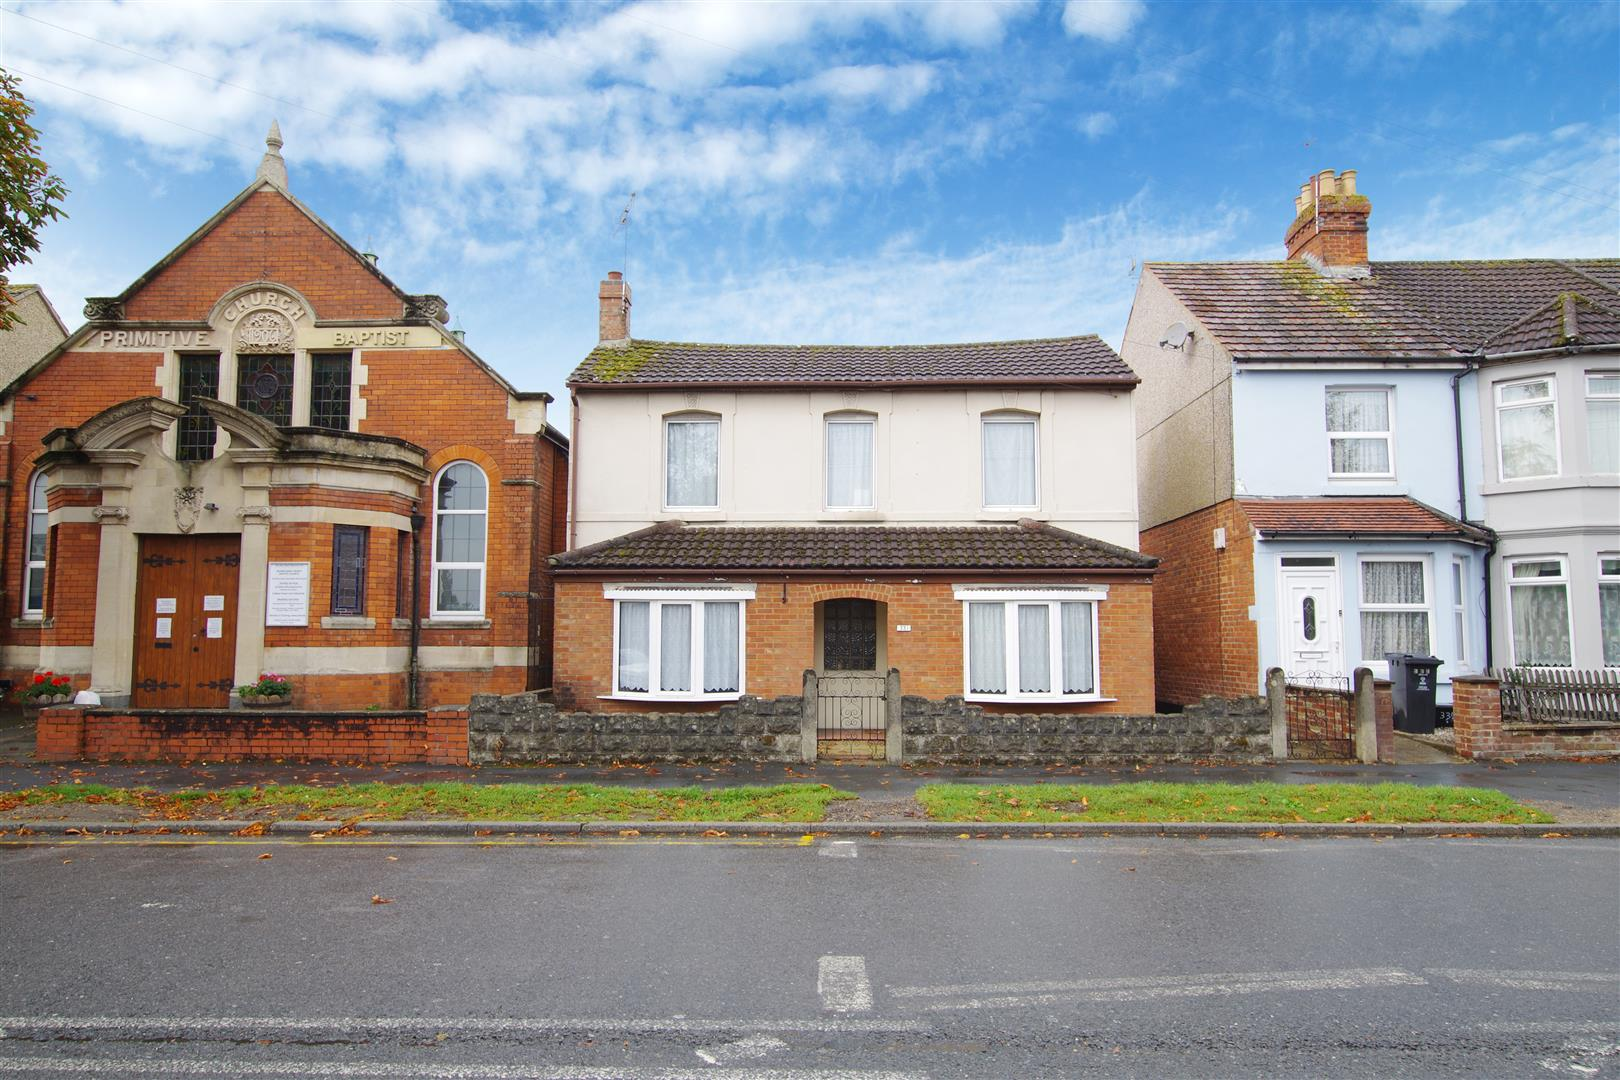 Cheney Manor Road, Swindon